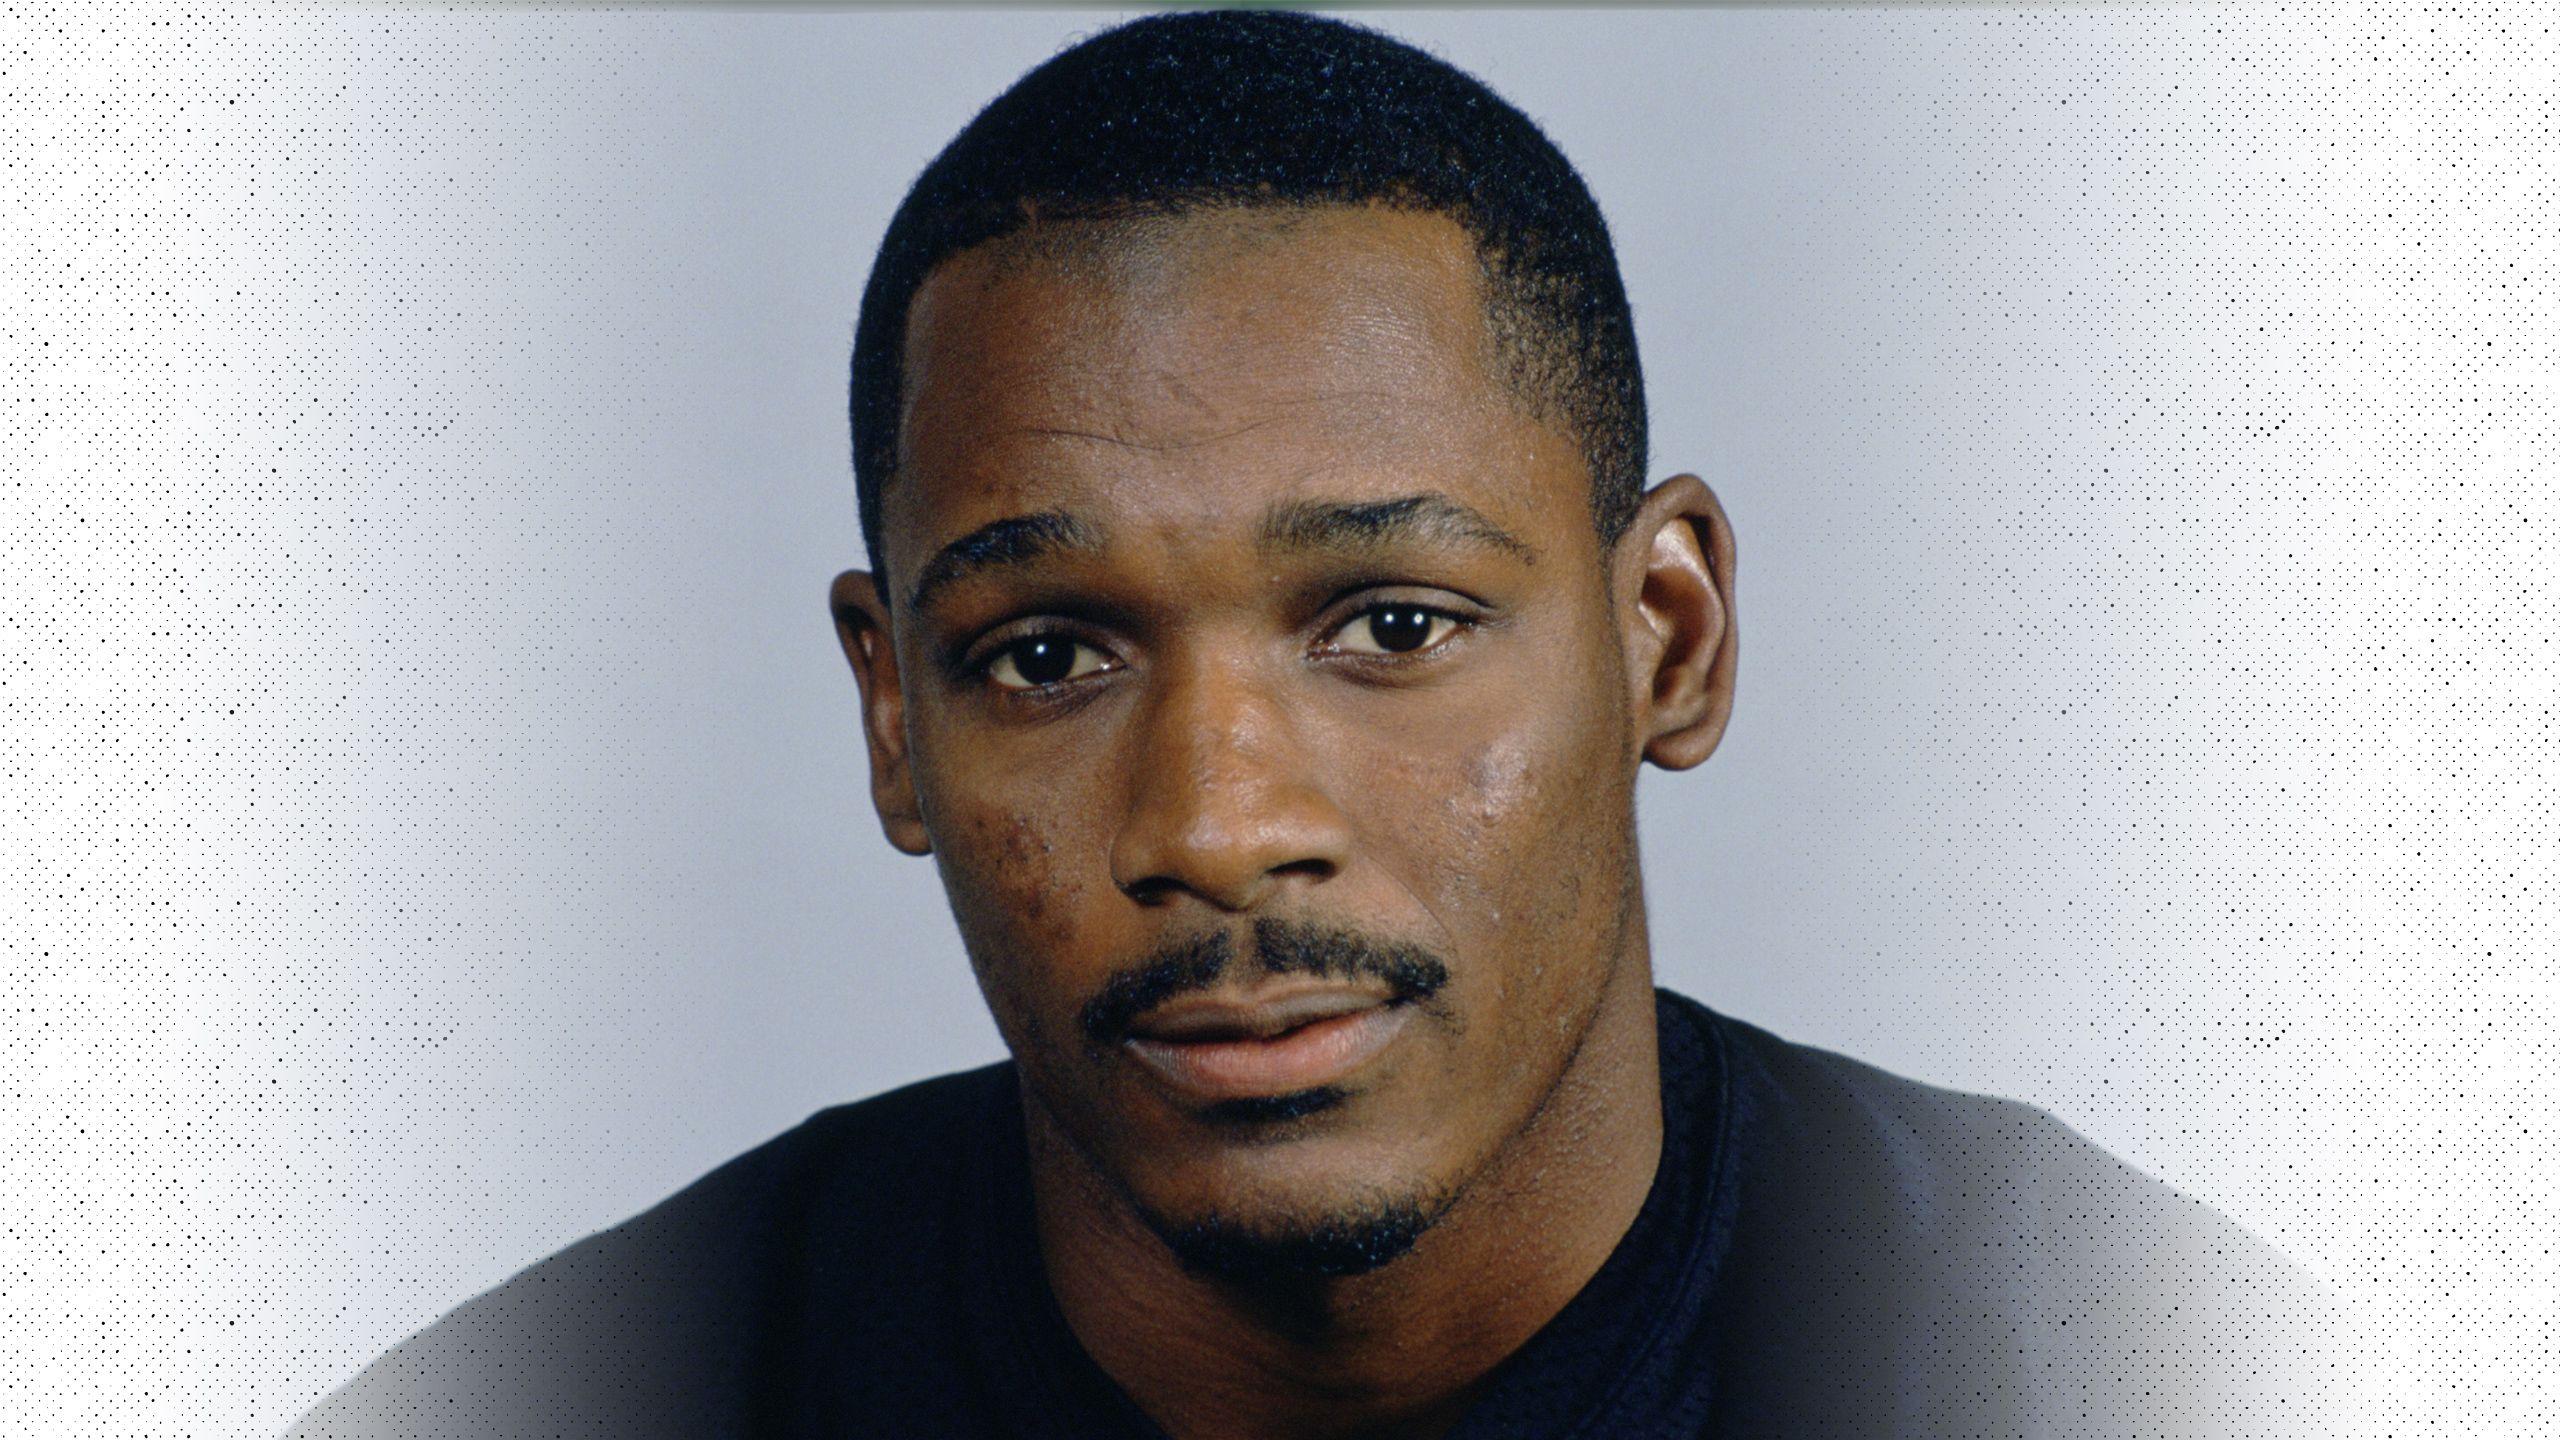 Tyrone Montgomery